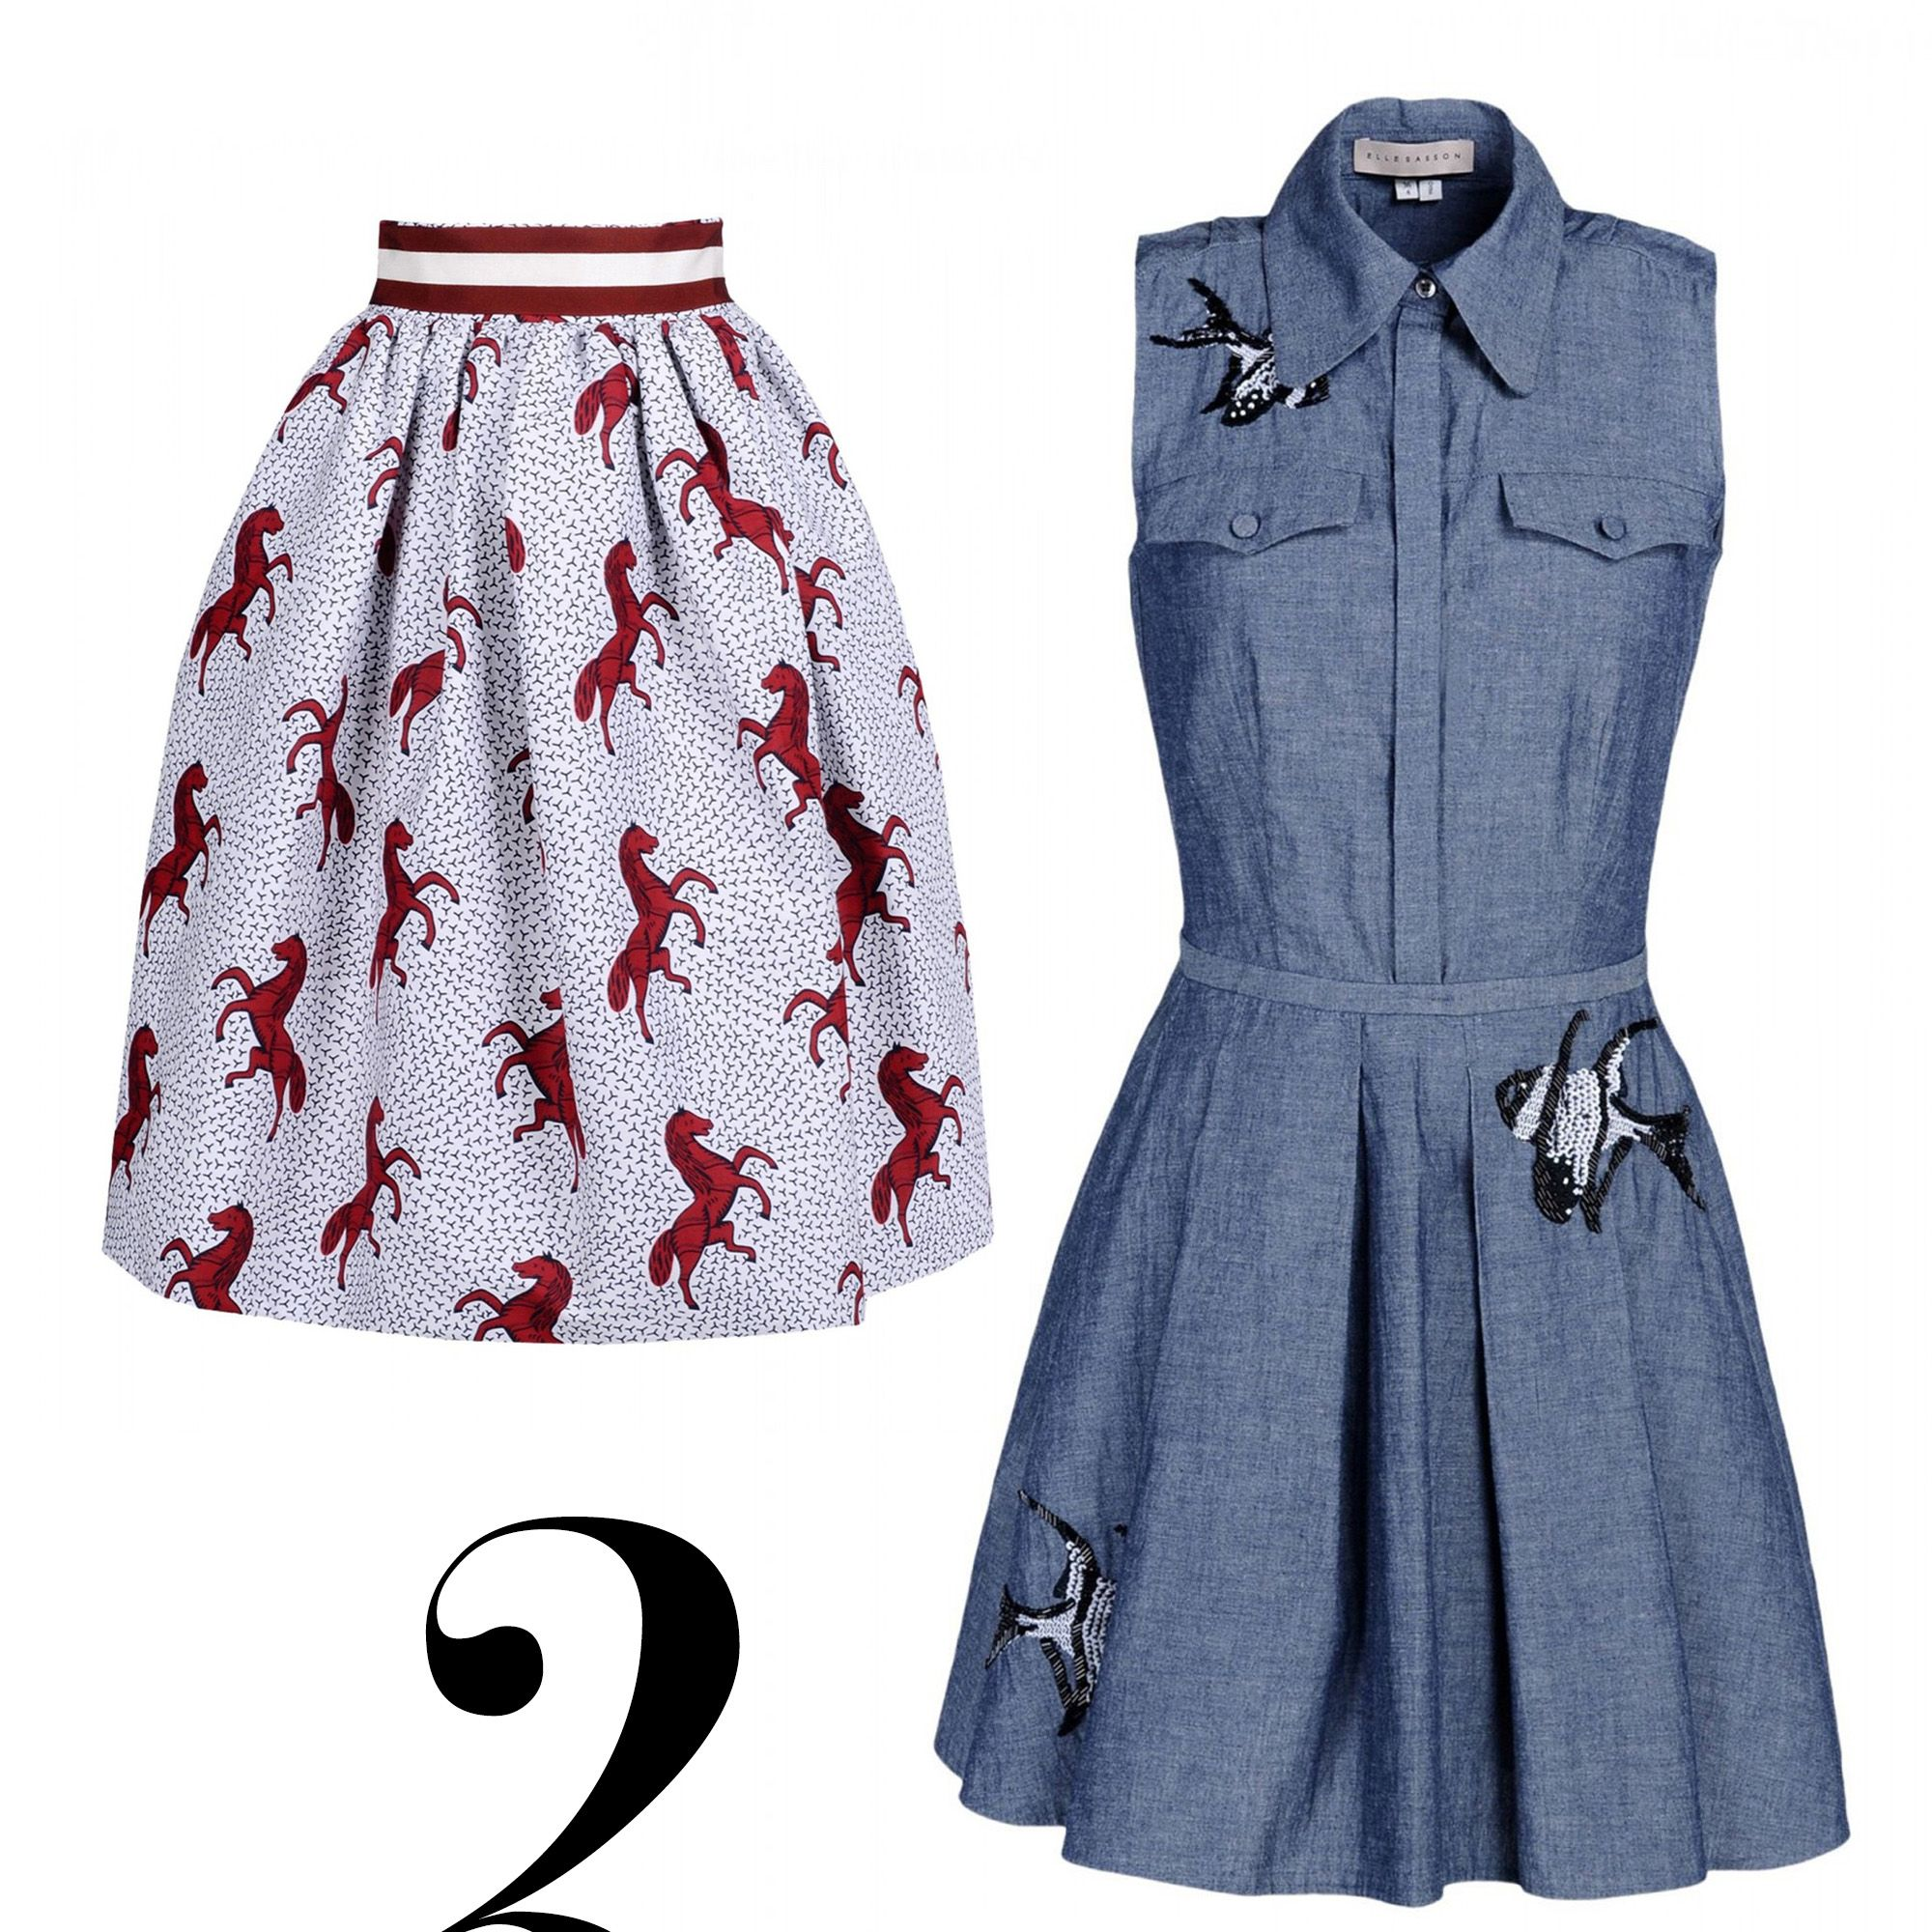 "<em>Stella Jean skirt, $770, <a href=""http://shop.harpersbazaar.com/designers/stella-jean/pipistrello-printed-skirt/"" target=""_blank"">shopBAZAAR.com</a>&#x3B; Elle Sasson dress, $590, <a href=""http://shop.harpersbazaar.com/designers/elle-sasson/gulper-dress-5/"" target=""_blank"">shopBAZAAR.com</a>&#x3B; Valentino bag, $4,445, <a href=""http://shop.harpersbazaar.com/designers/valentino/feather-mini-lock-shoulder-bag/"" target=""_blank"">shopBAZAAR.com</a>.</em>"